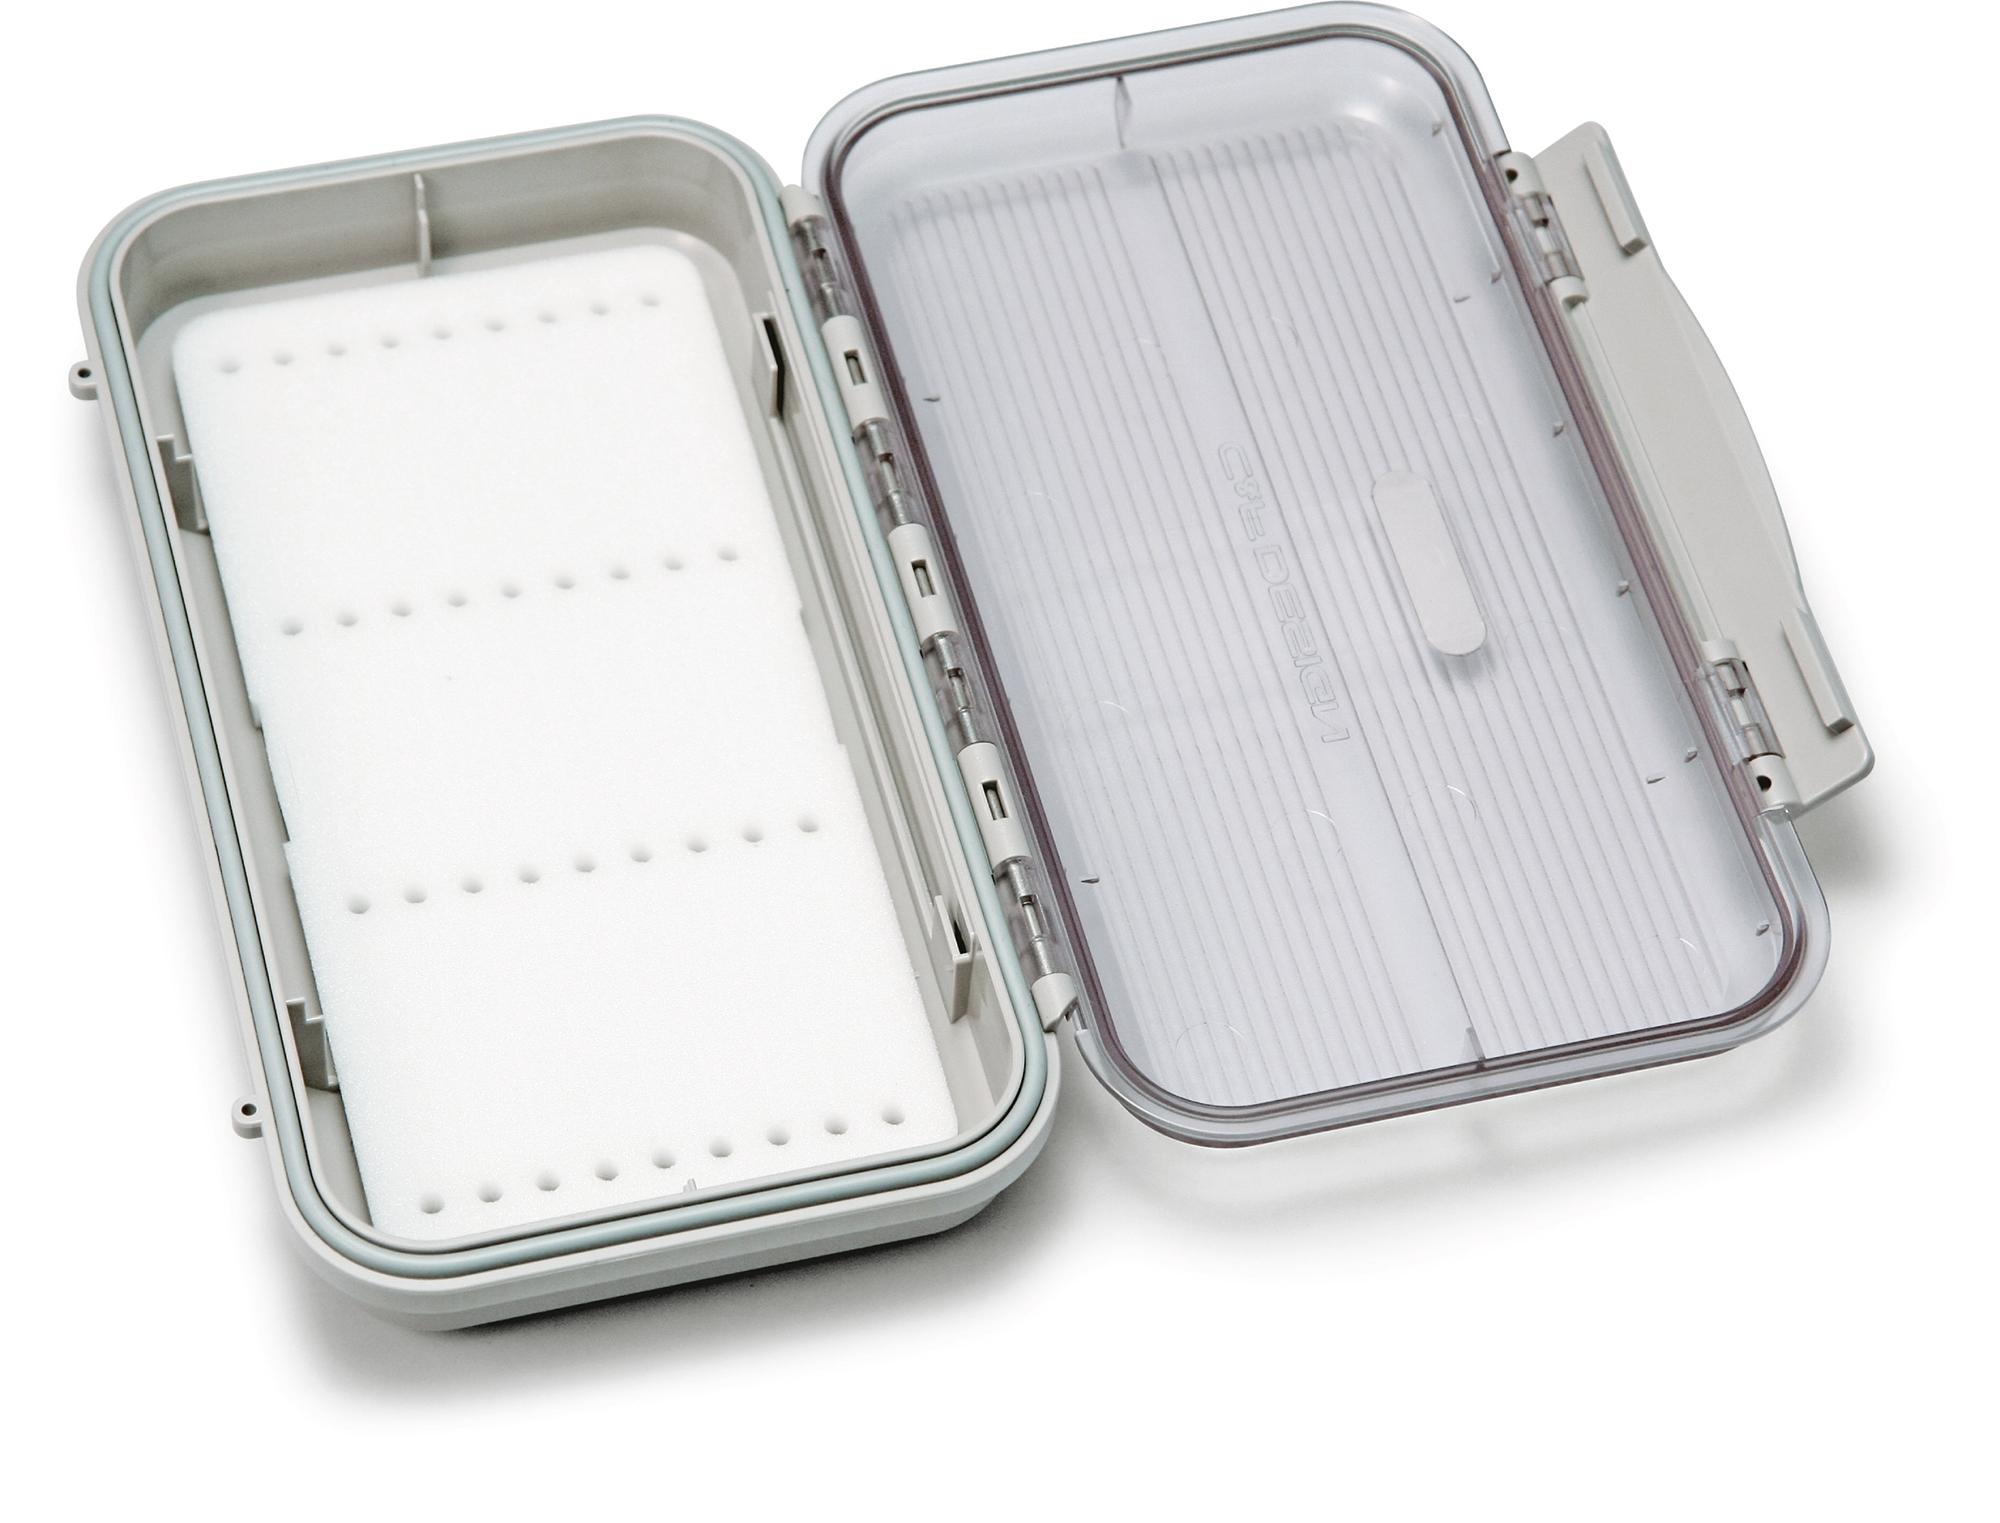 Grand Slam Box Waterproof Saltwater Box for Extra Large Flies